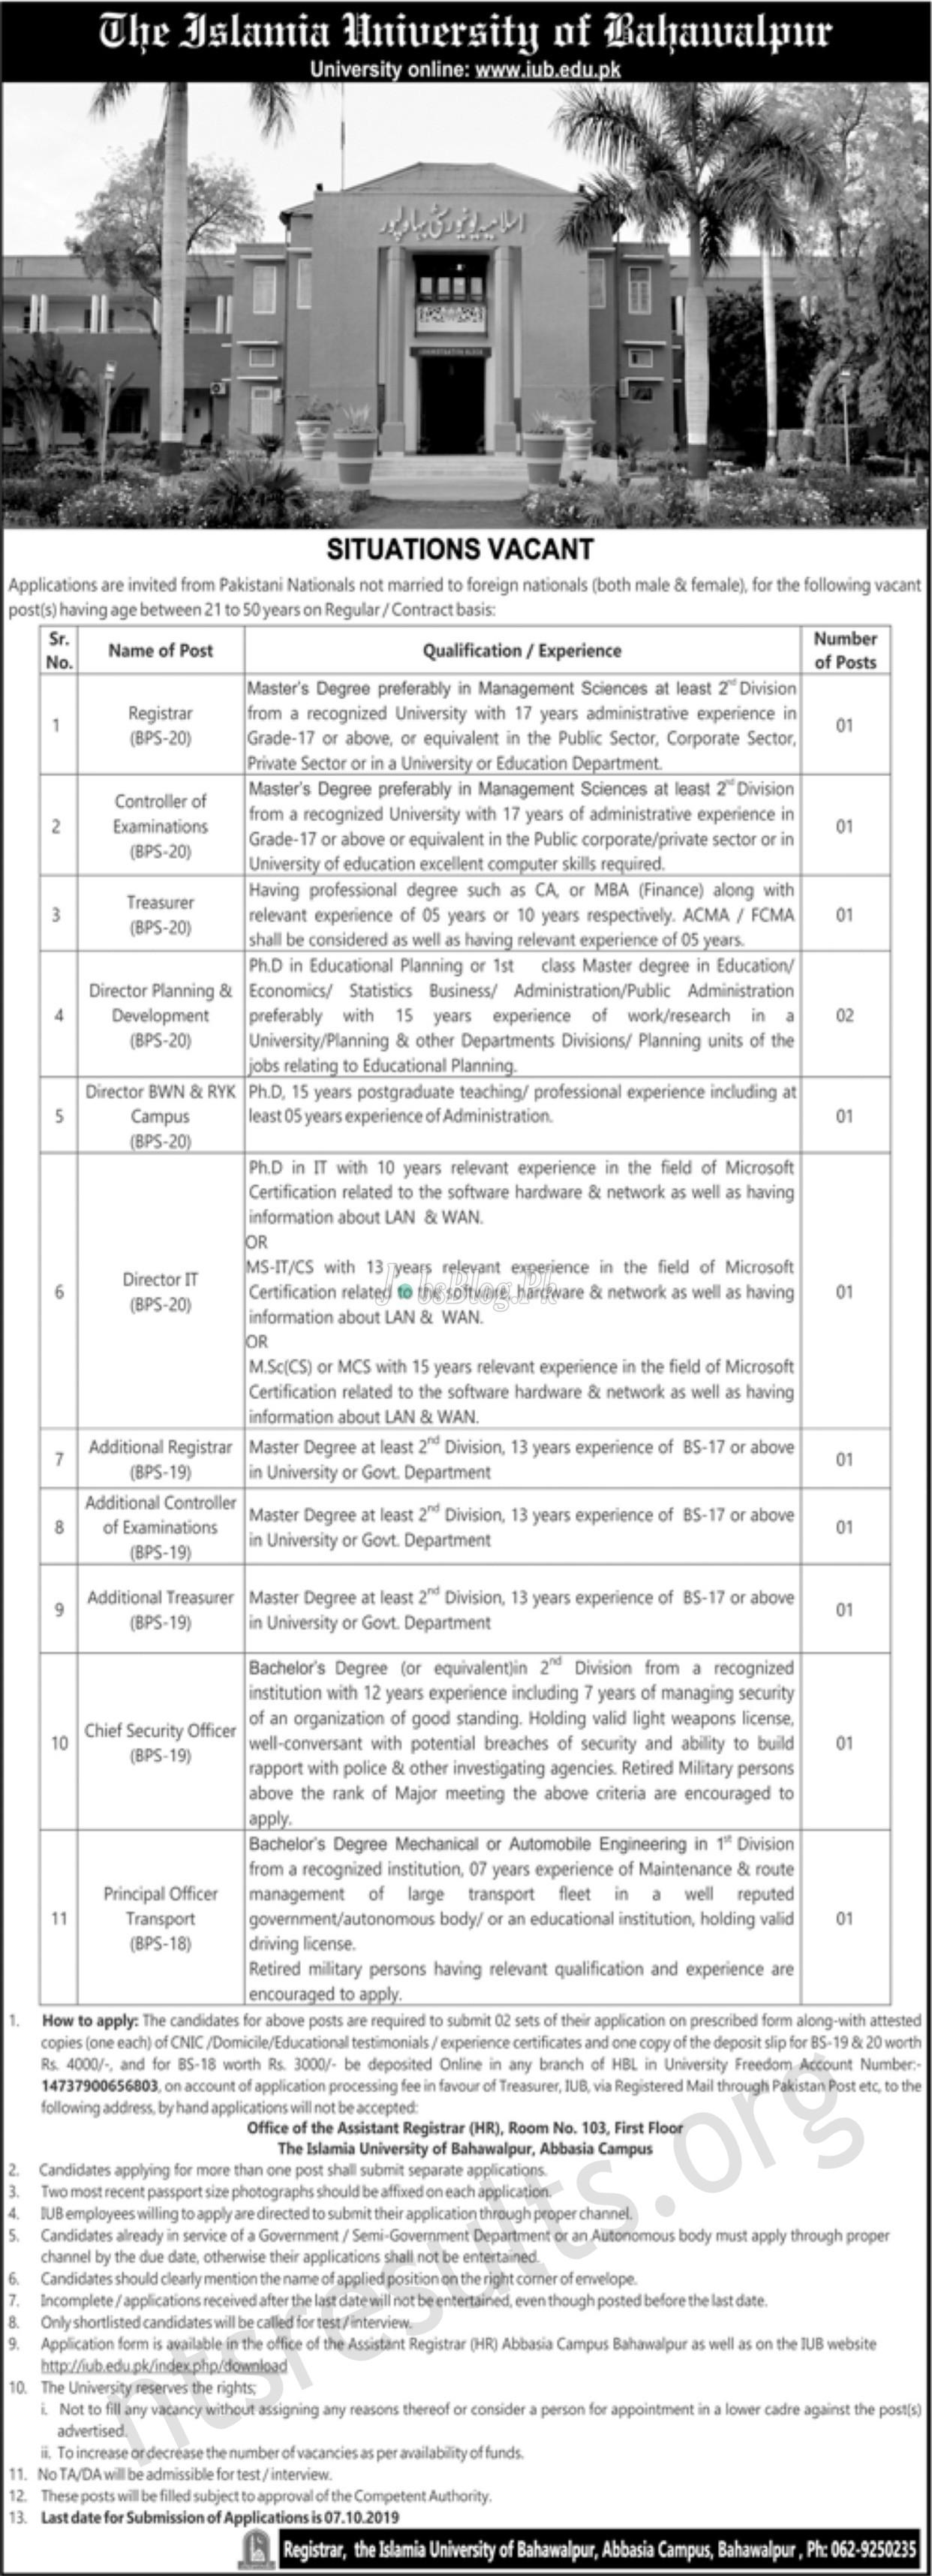 Islamia University of Bahawalpur IUB Jobs 2019